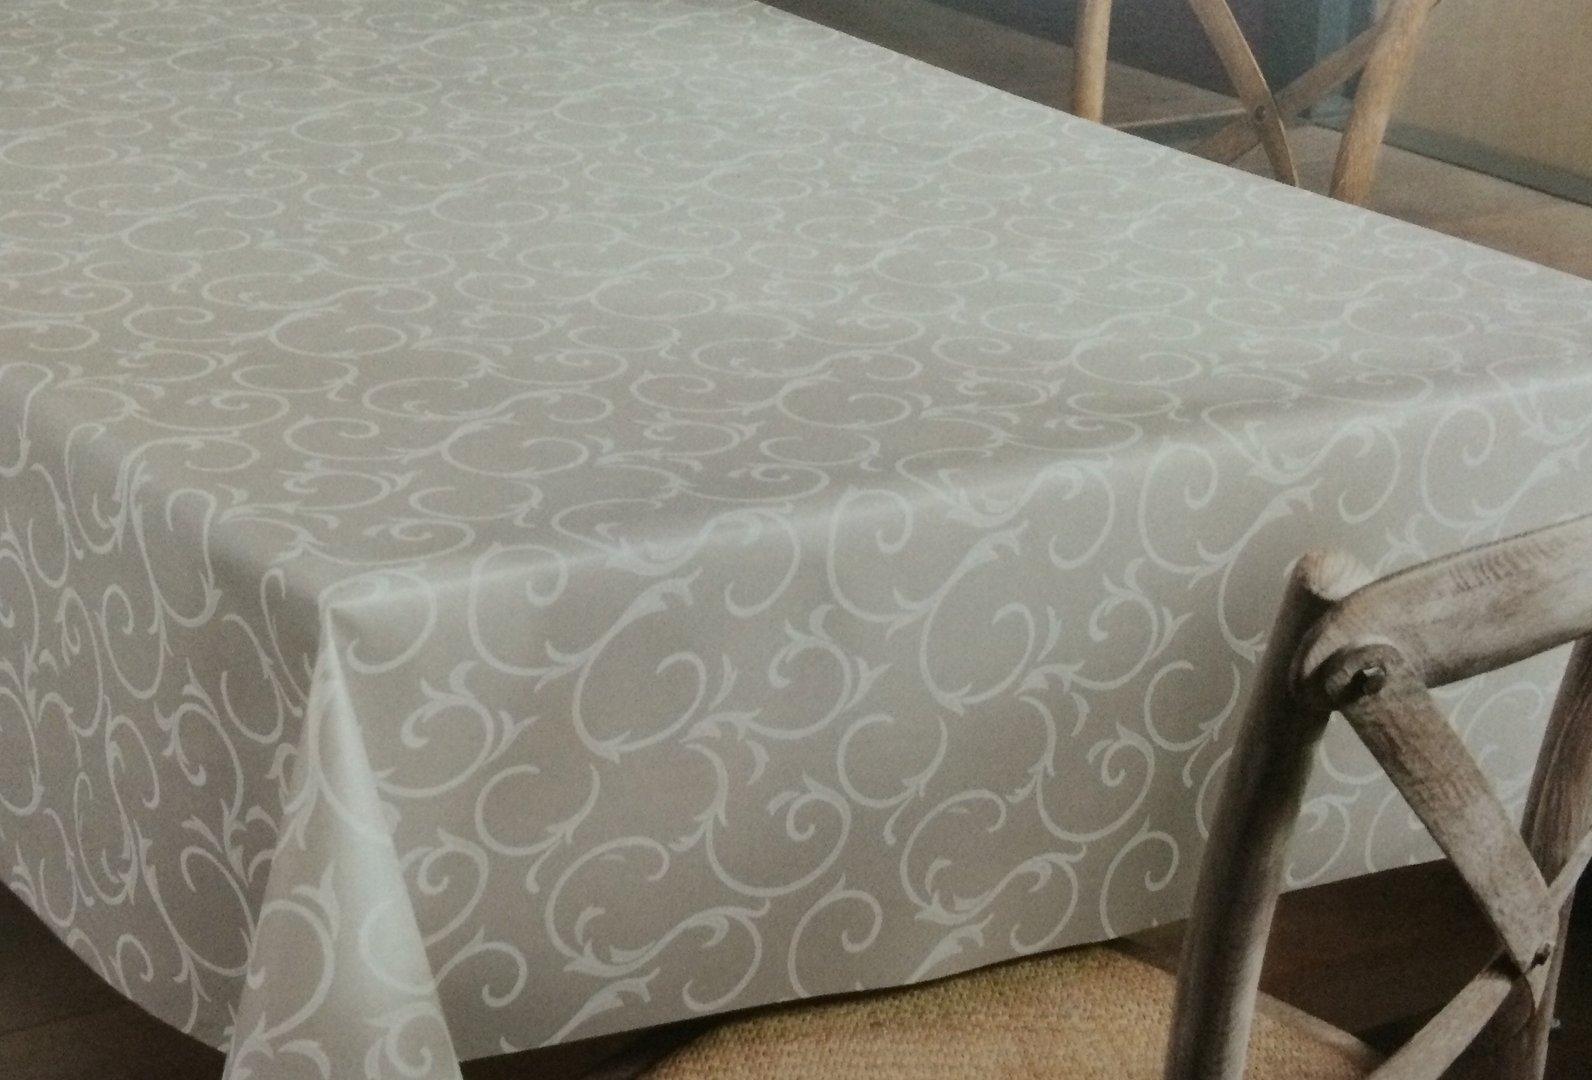 wachstuch tischdecke meterware modern k150193 barock grau. Black Bedroom Furniture Sets. Home Design Ideas